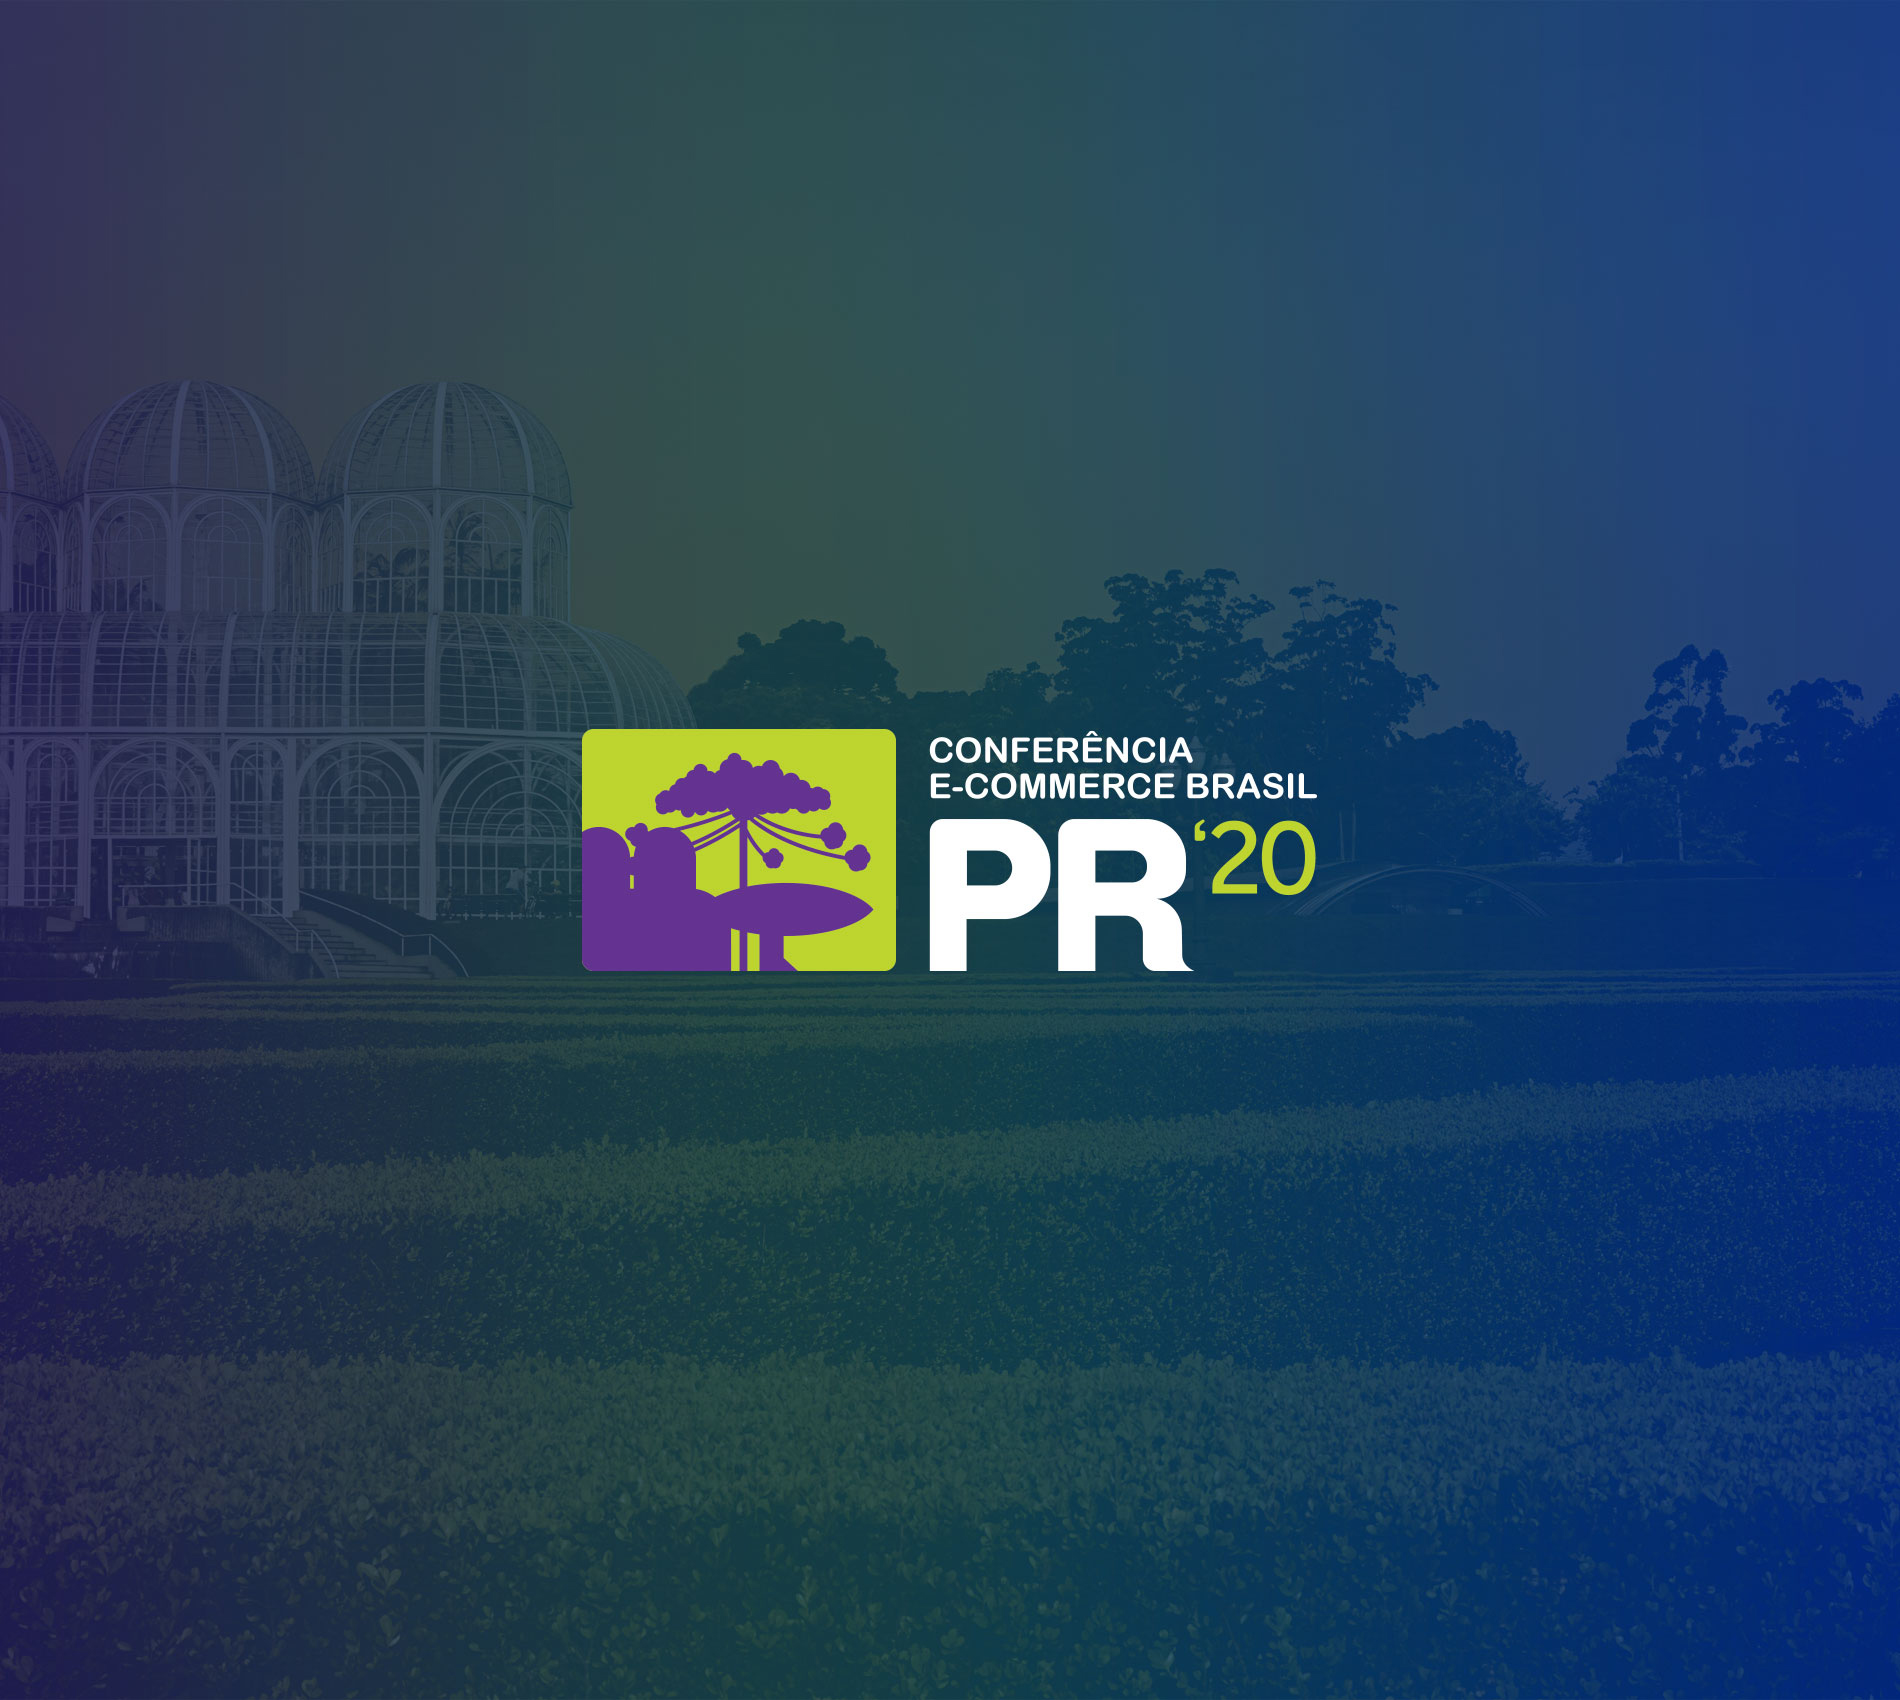 Conferência E-commerce Brasil PR 2020